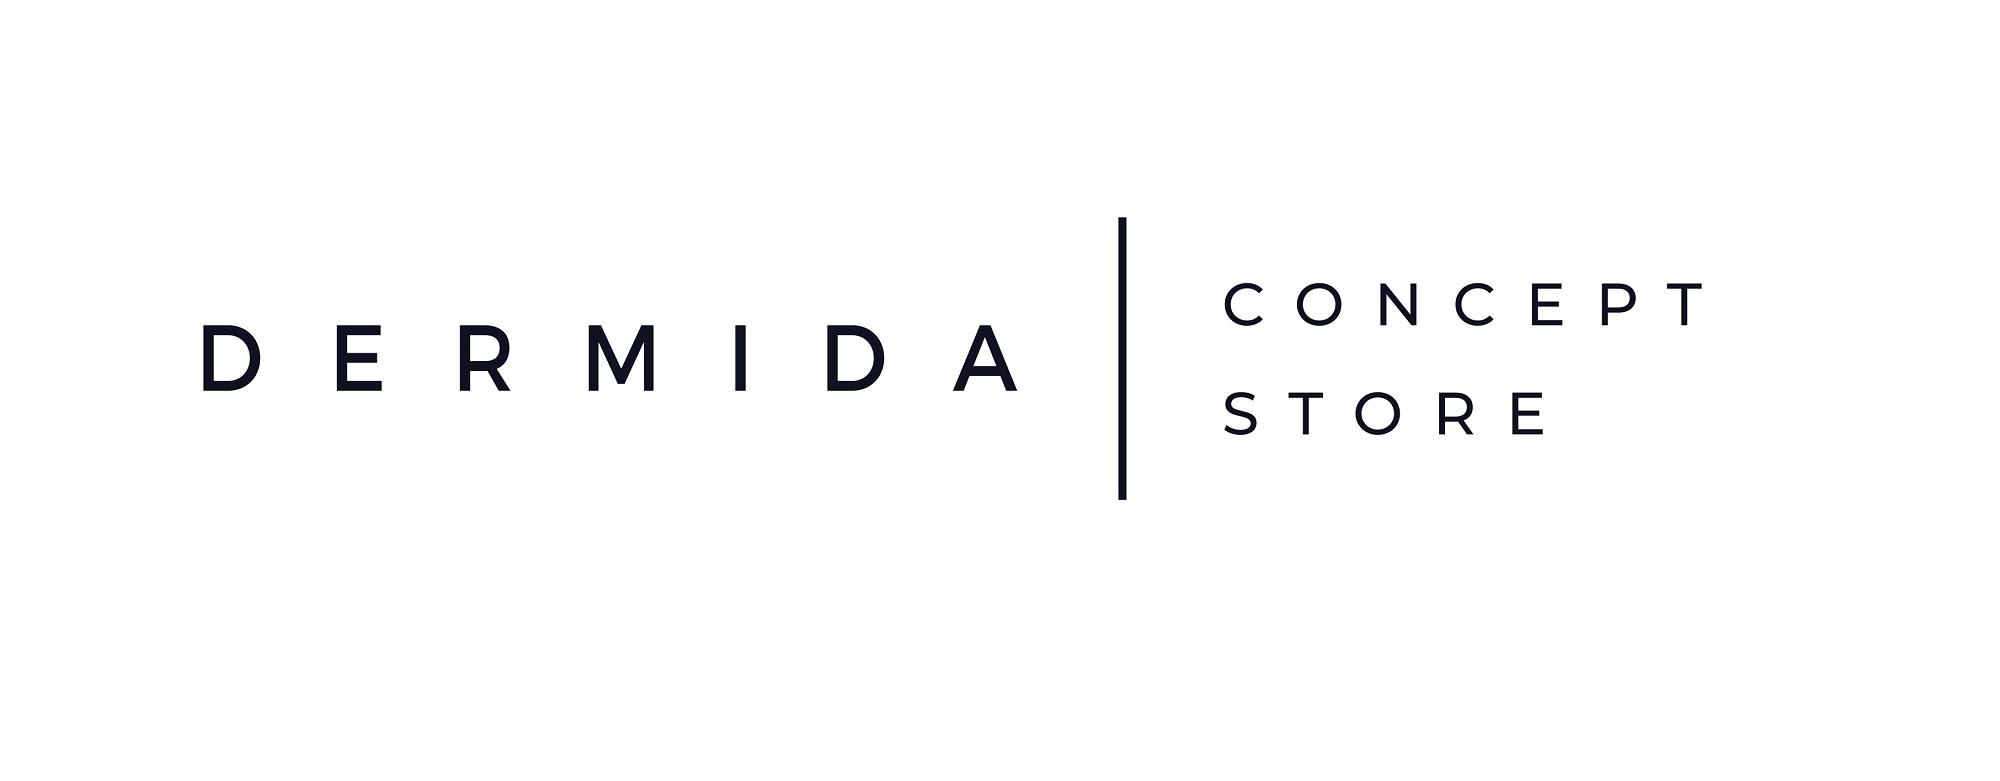 dermida-concept-store-logo